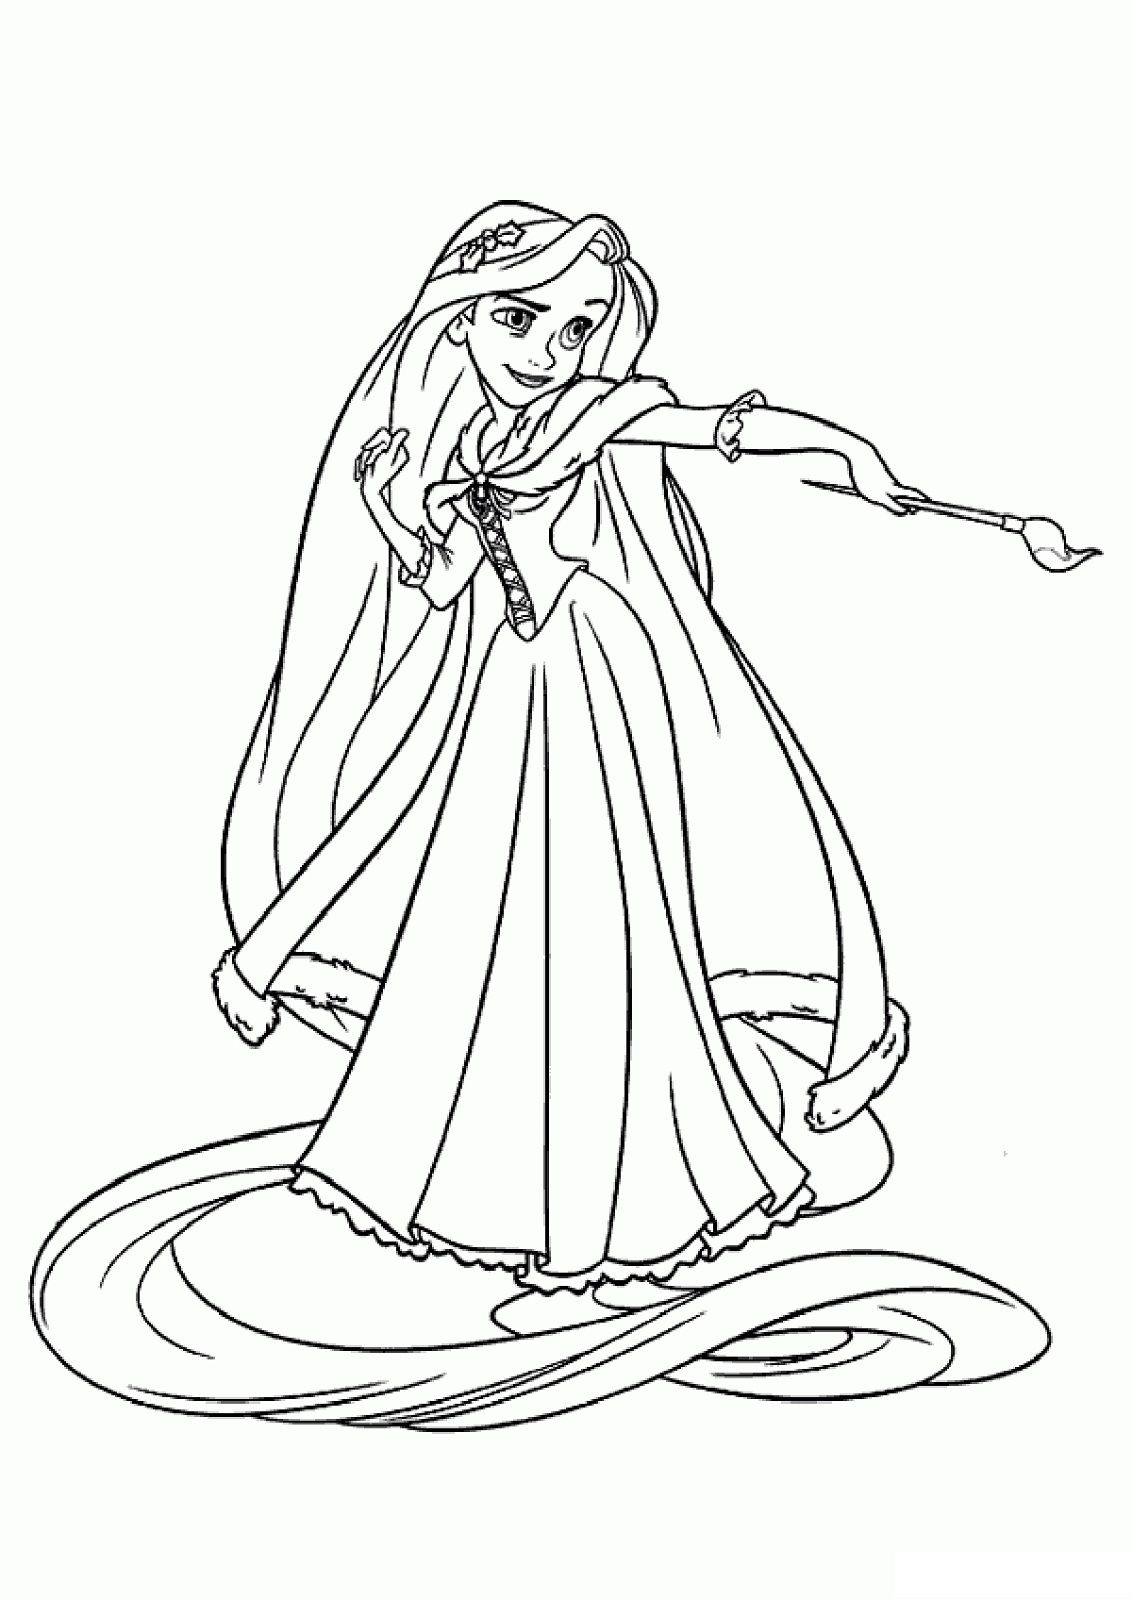 Tangled Printables For Kids Disney Coloring Pages Rapunzel Coloring Pages Cartoon Coloring Pages [ 1600 x 1132 Pixel ]